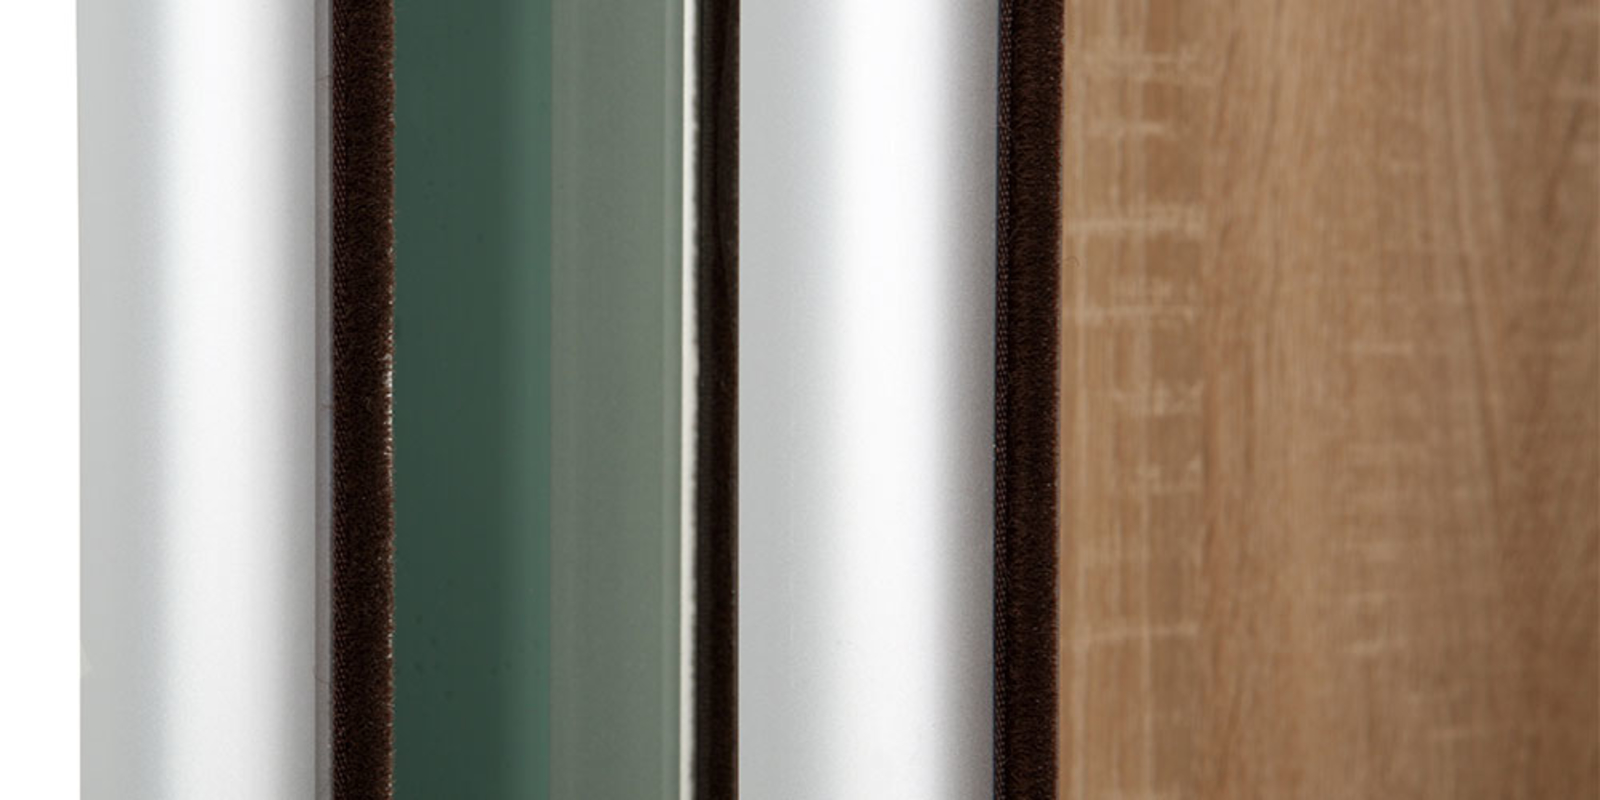 Шкаф-купе трехдверный Манхеттен дуб сонома/зеркальный от HomeMe.ru